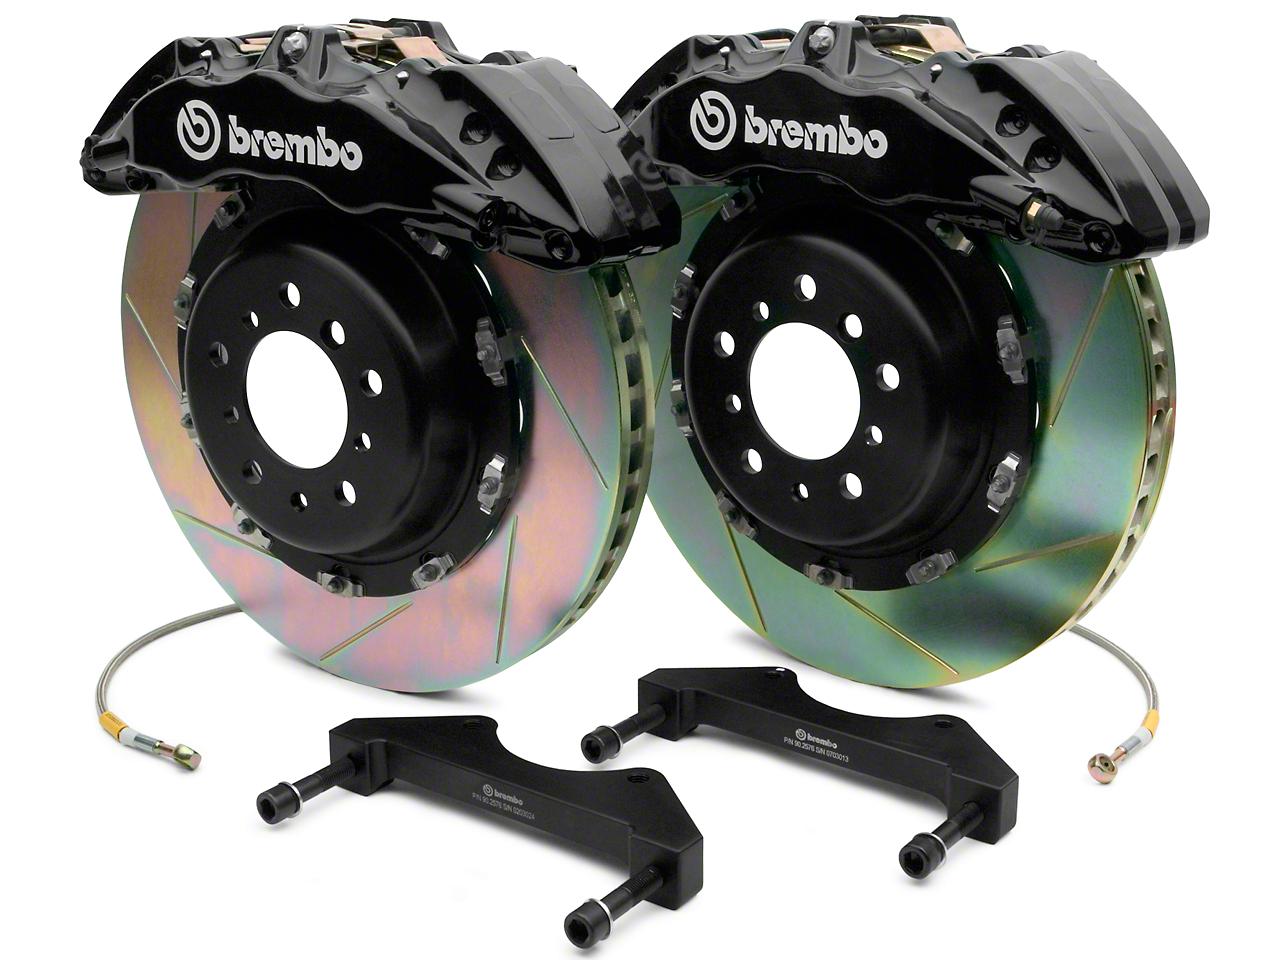 Brembo GT Series 6-Piston Front Brake Kit - 2-Piece Slotted Rotors - Black (07-18 Sierra 1500)